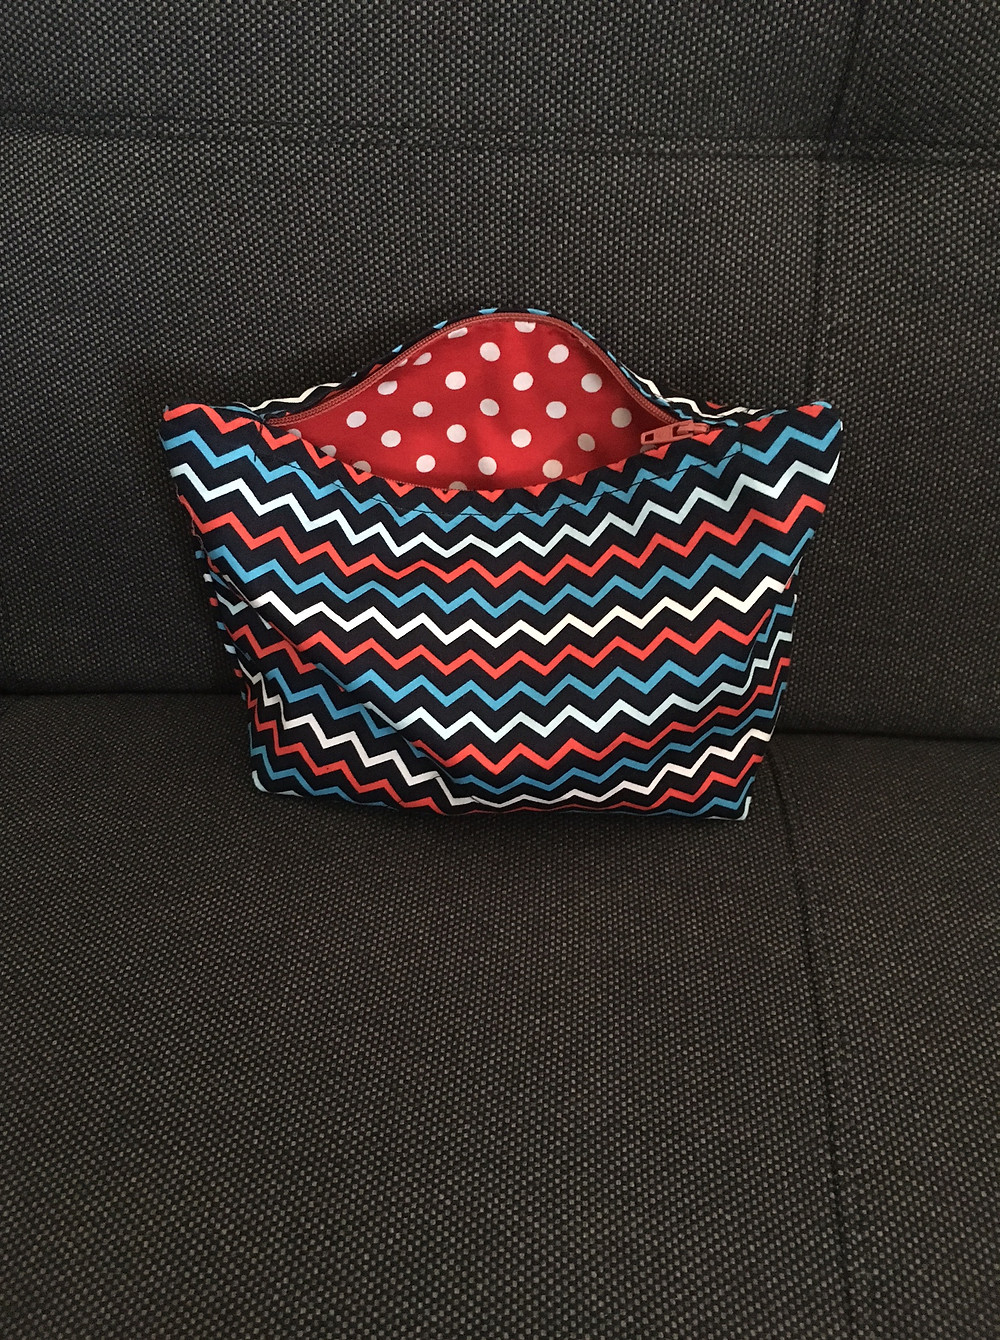 Lined zipped bag 3